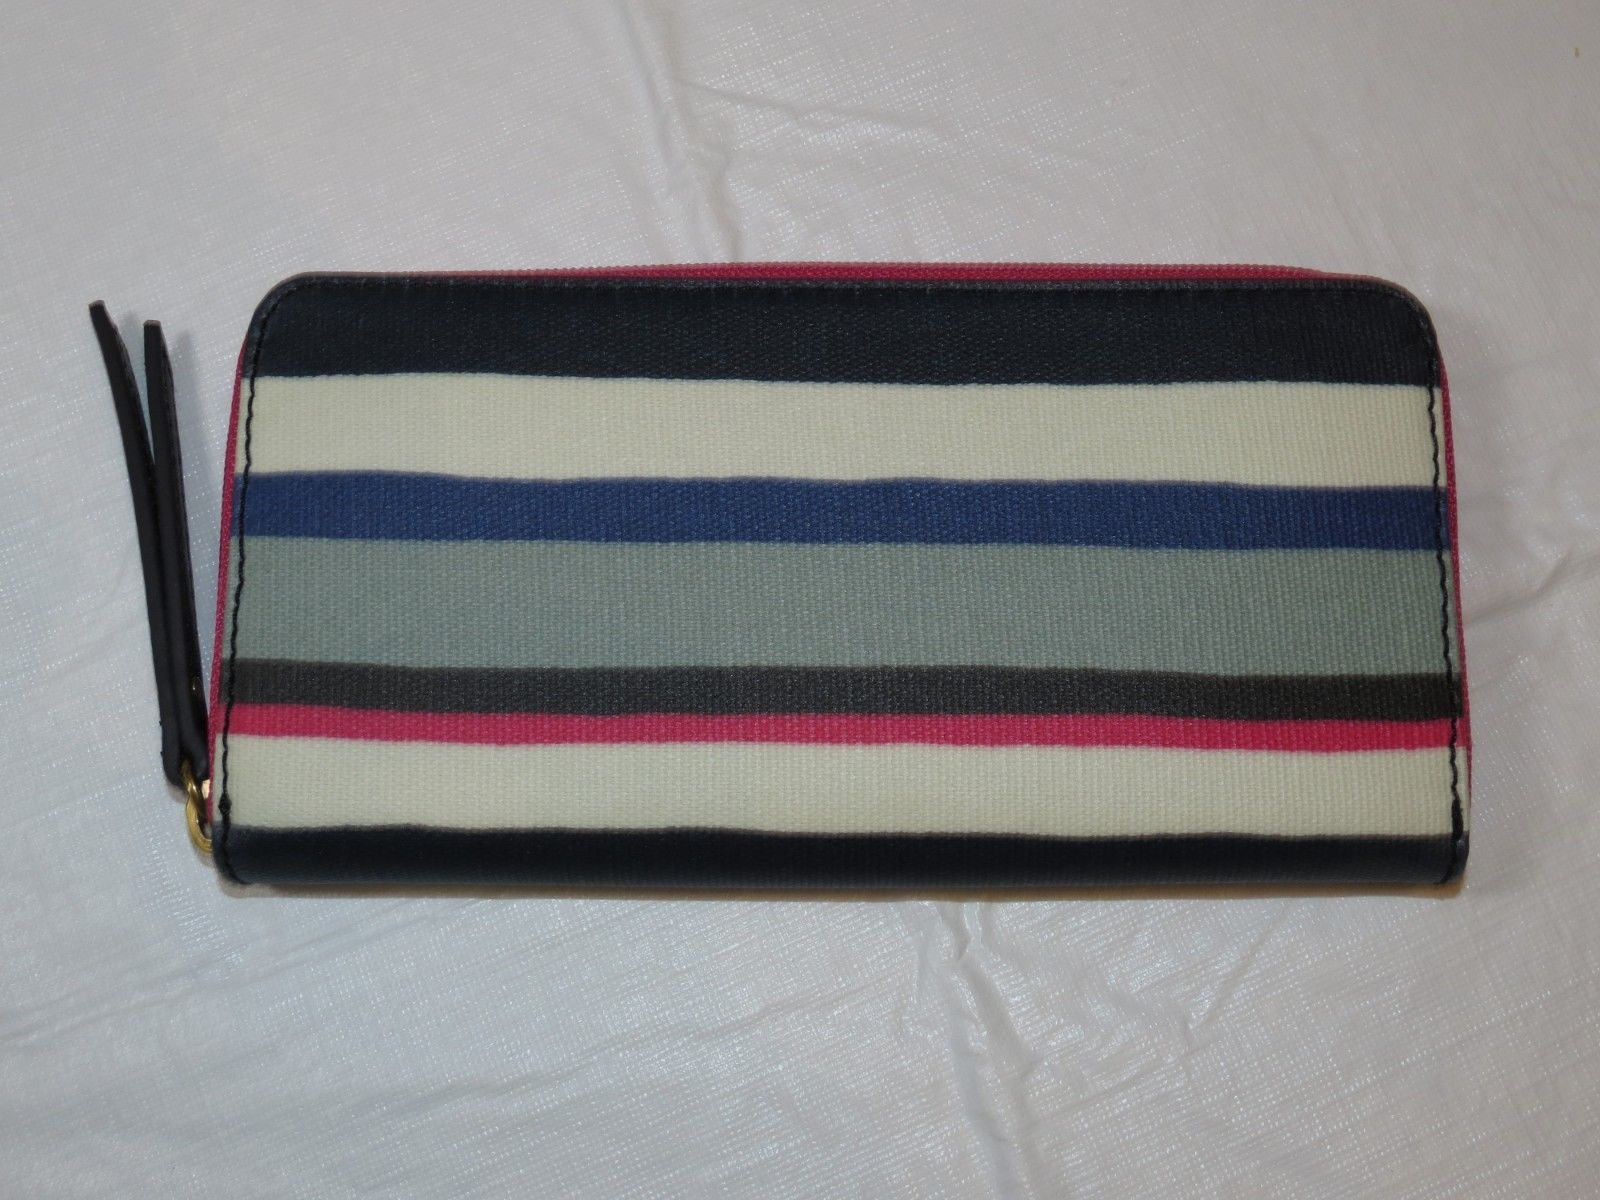 Fossil SWL2034425 Eliza Clutch Blue Multi Stripe coated canvas clutch wallet *^ image 2